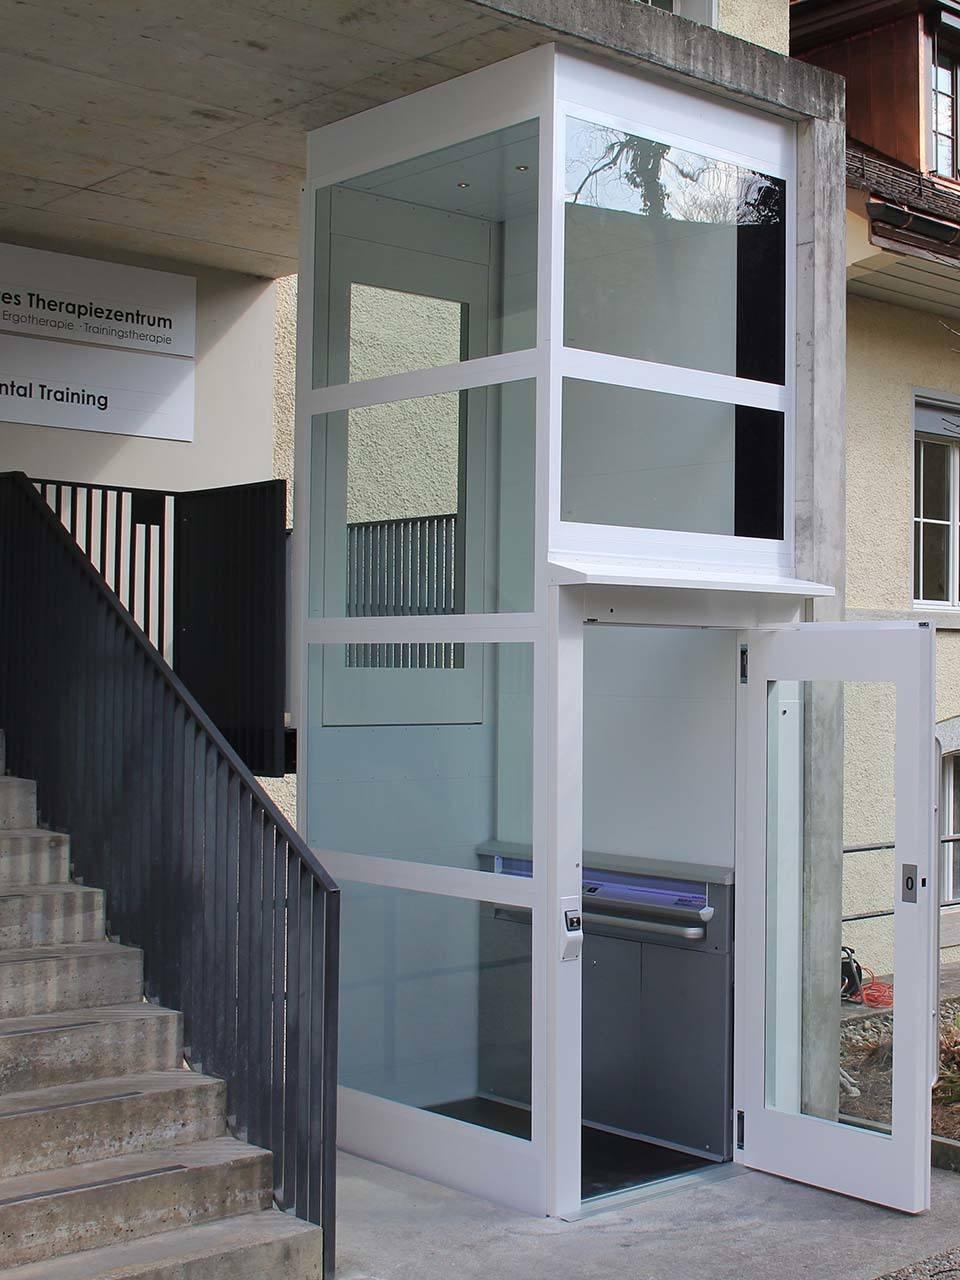 Barrierefreier Zugang Klinik mit Aussenlift